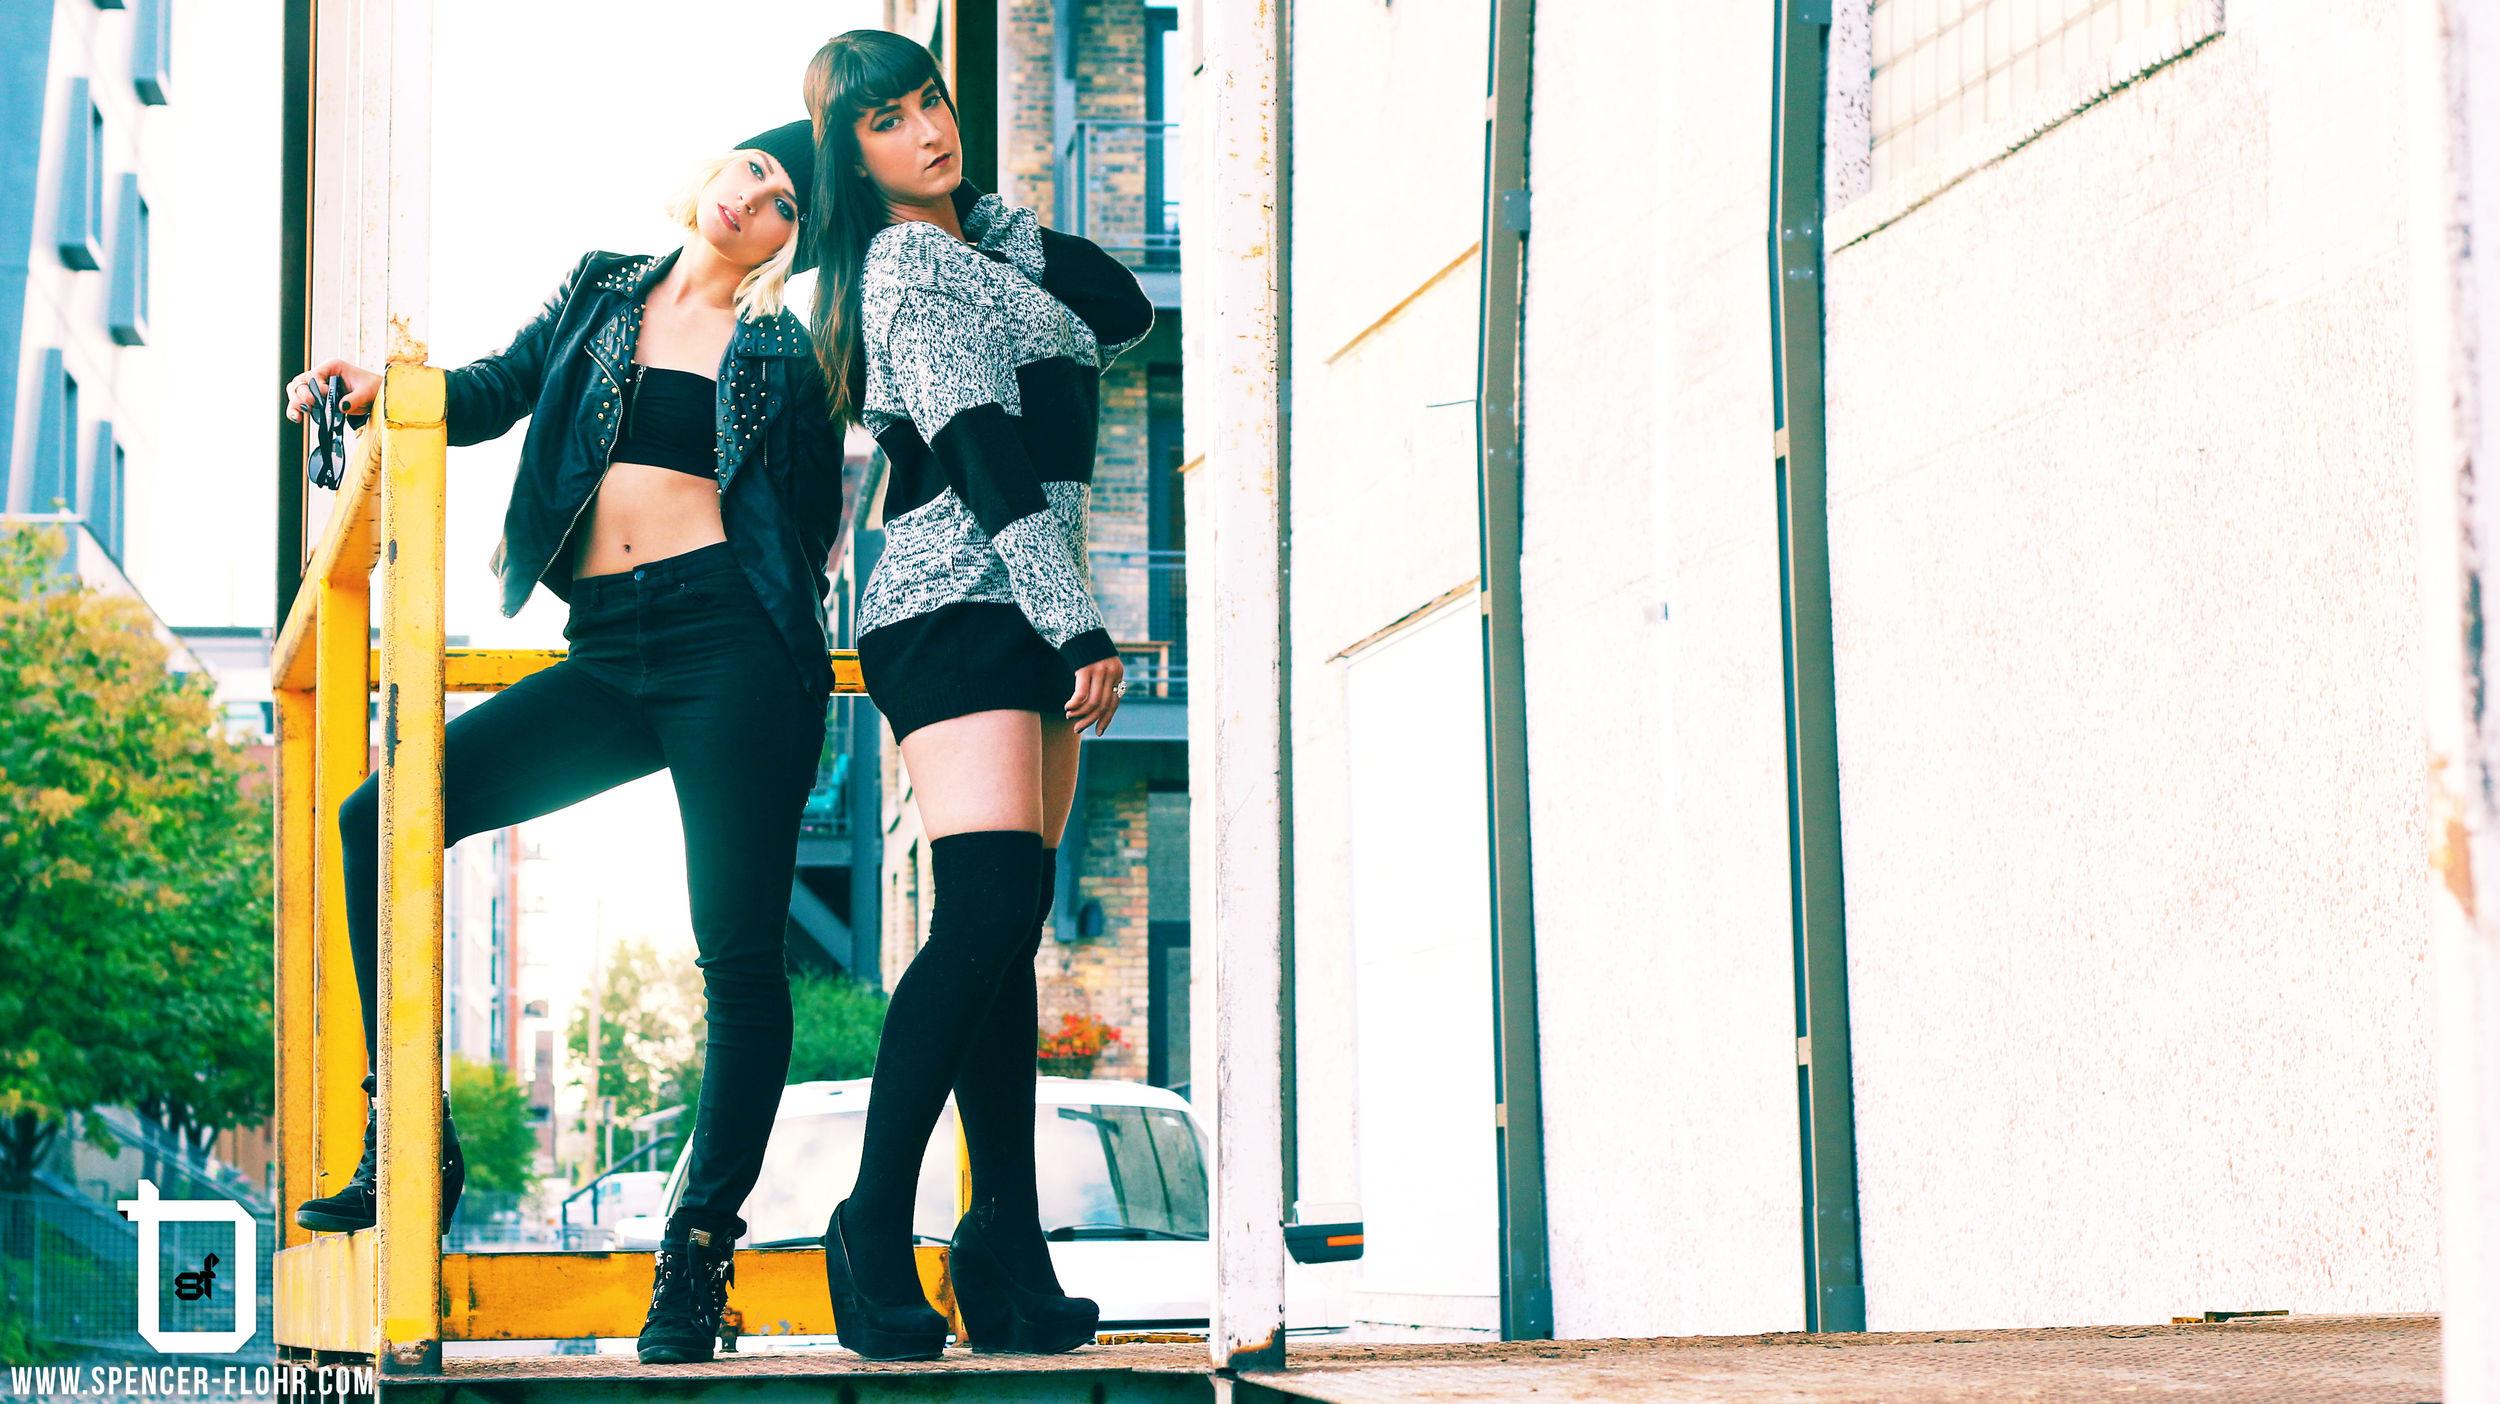 Bria & Mandi - 1.jpg